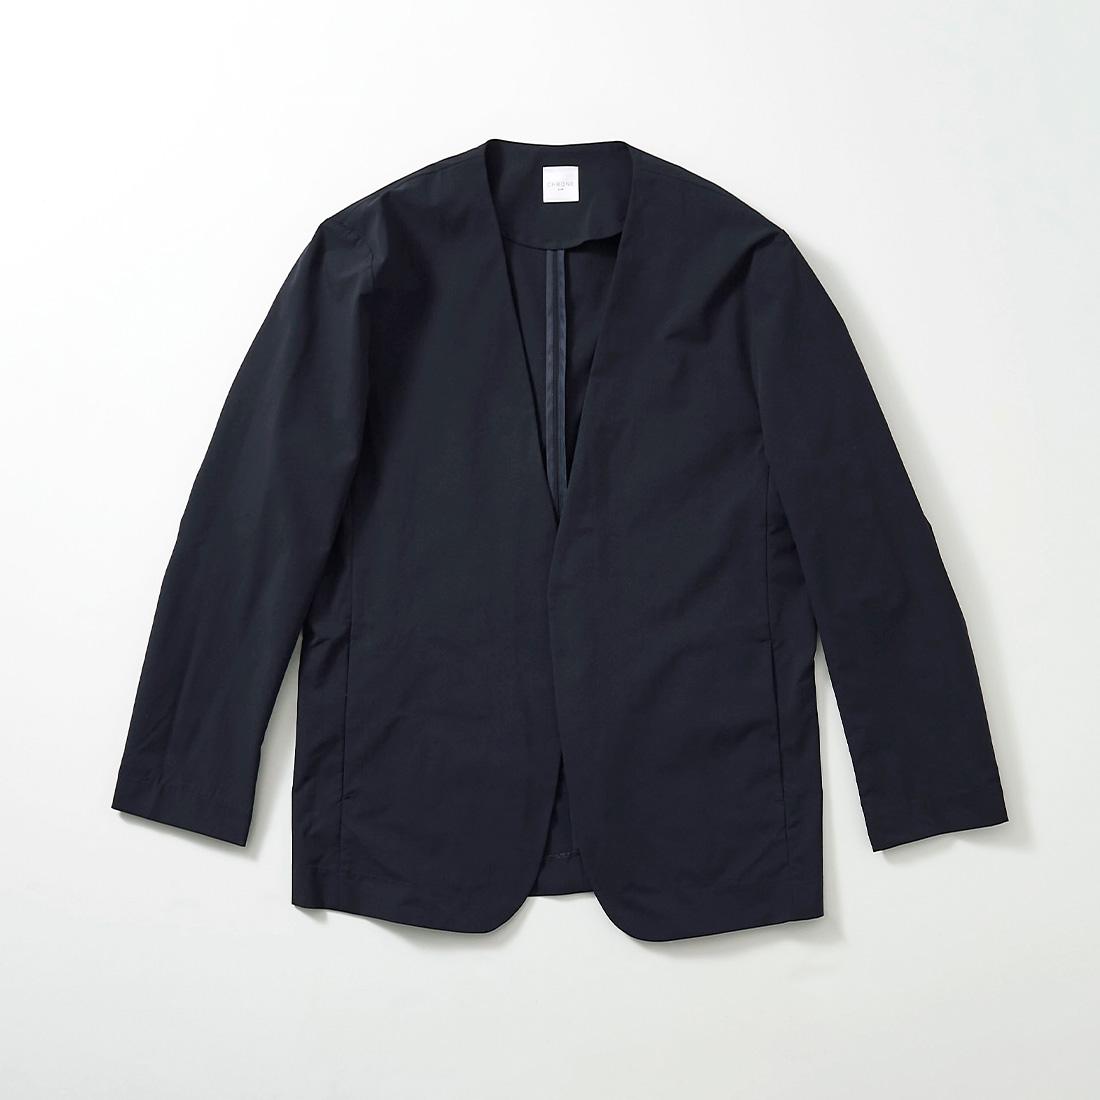 borderless no-collar jacket -male-の商品写真2